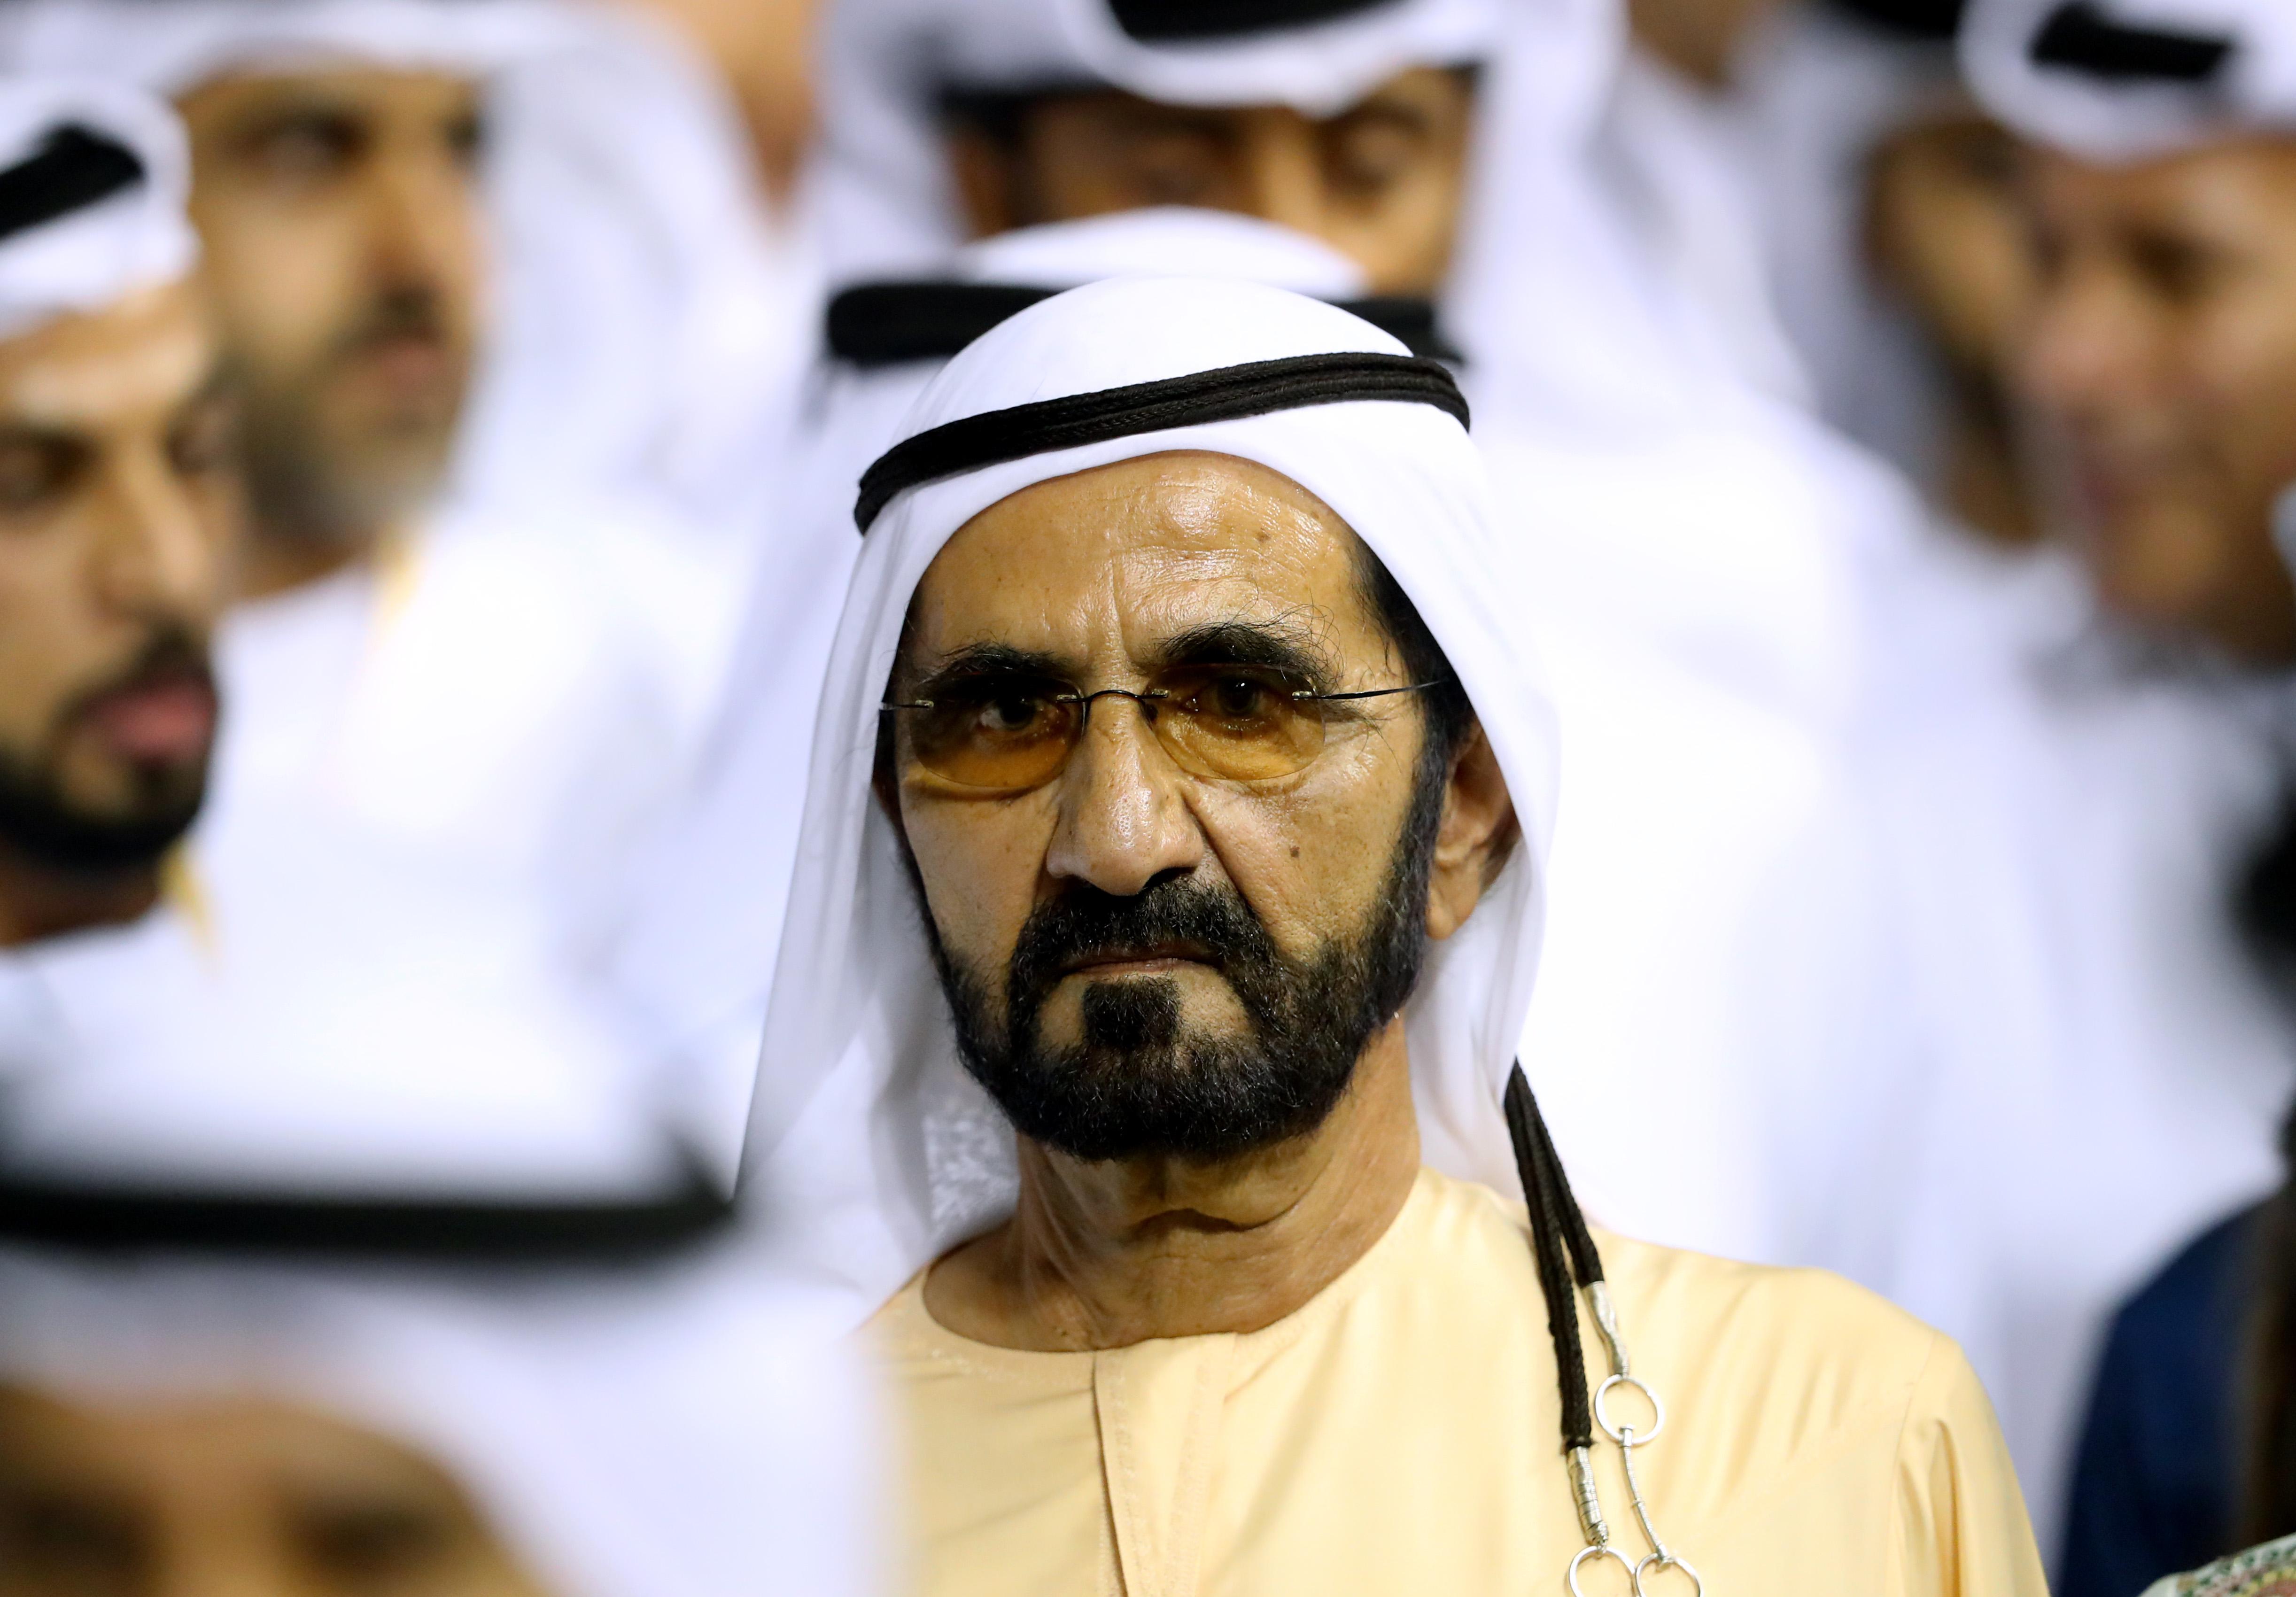 Sheikh Mohammed bin Rashid Al Maktoum, Vice President and Prime Minister of the UAE and Ruler of Dubai, denies he is holding his daughter, Princess Latifa, under house arrest.